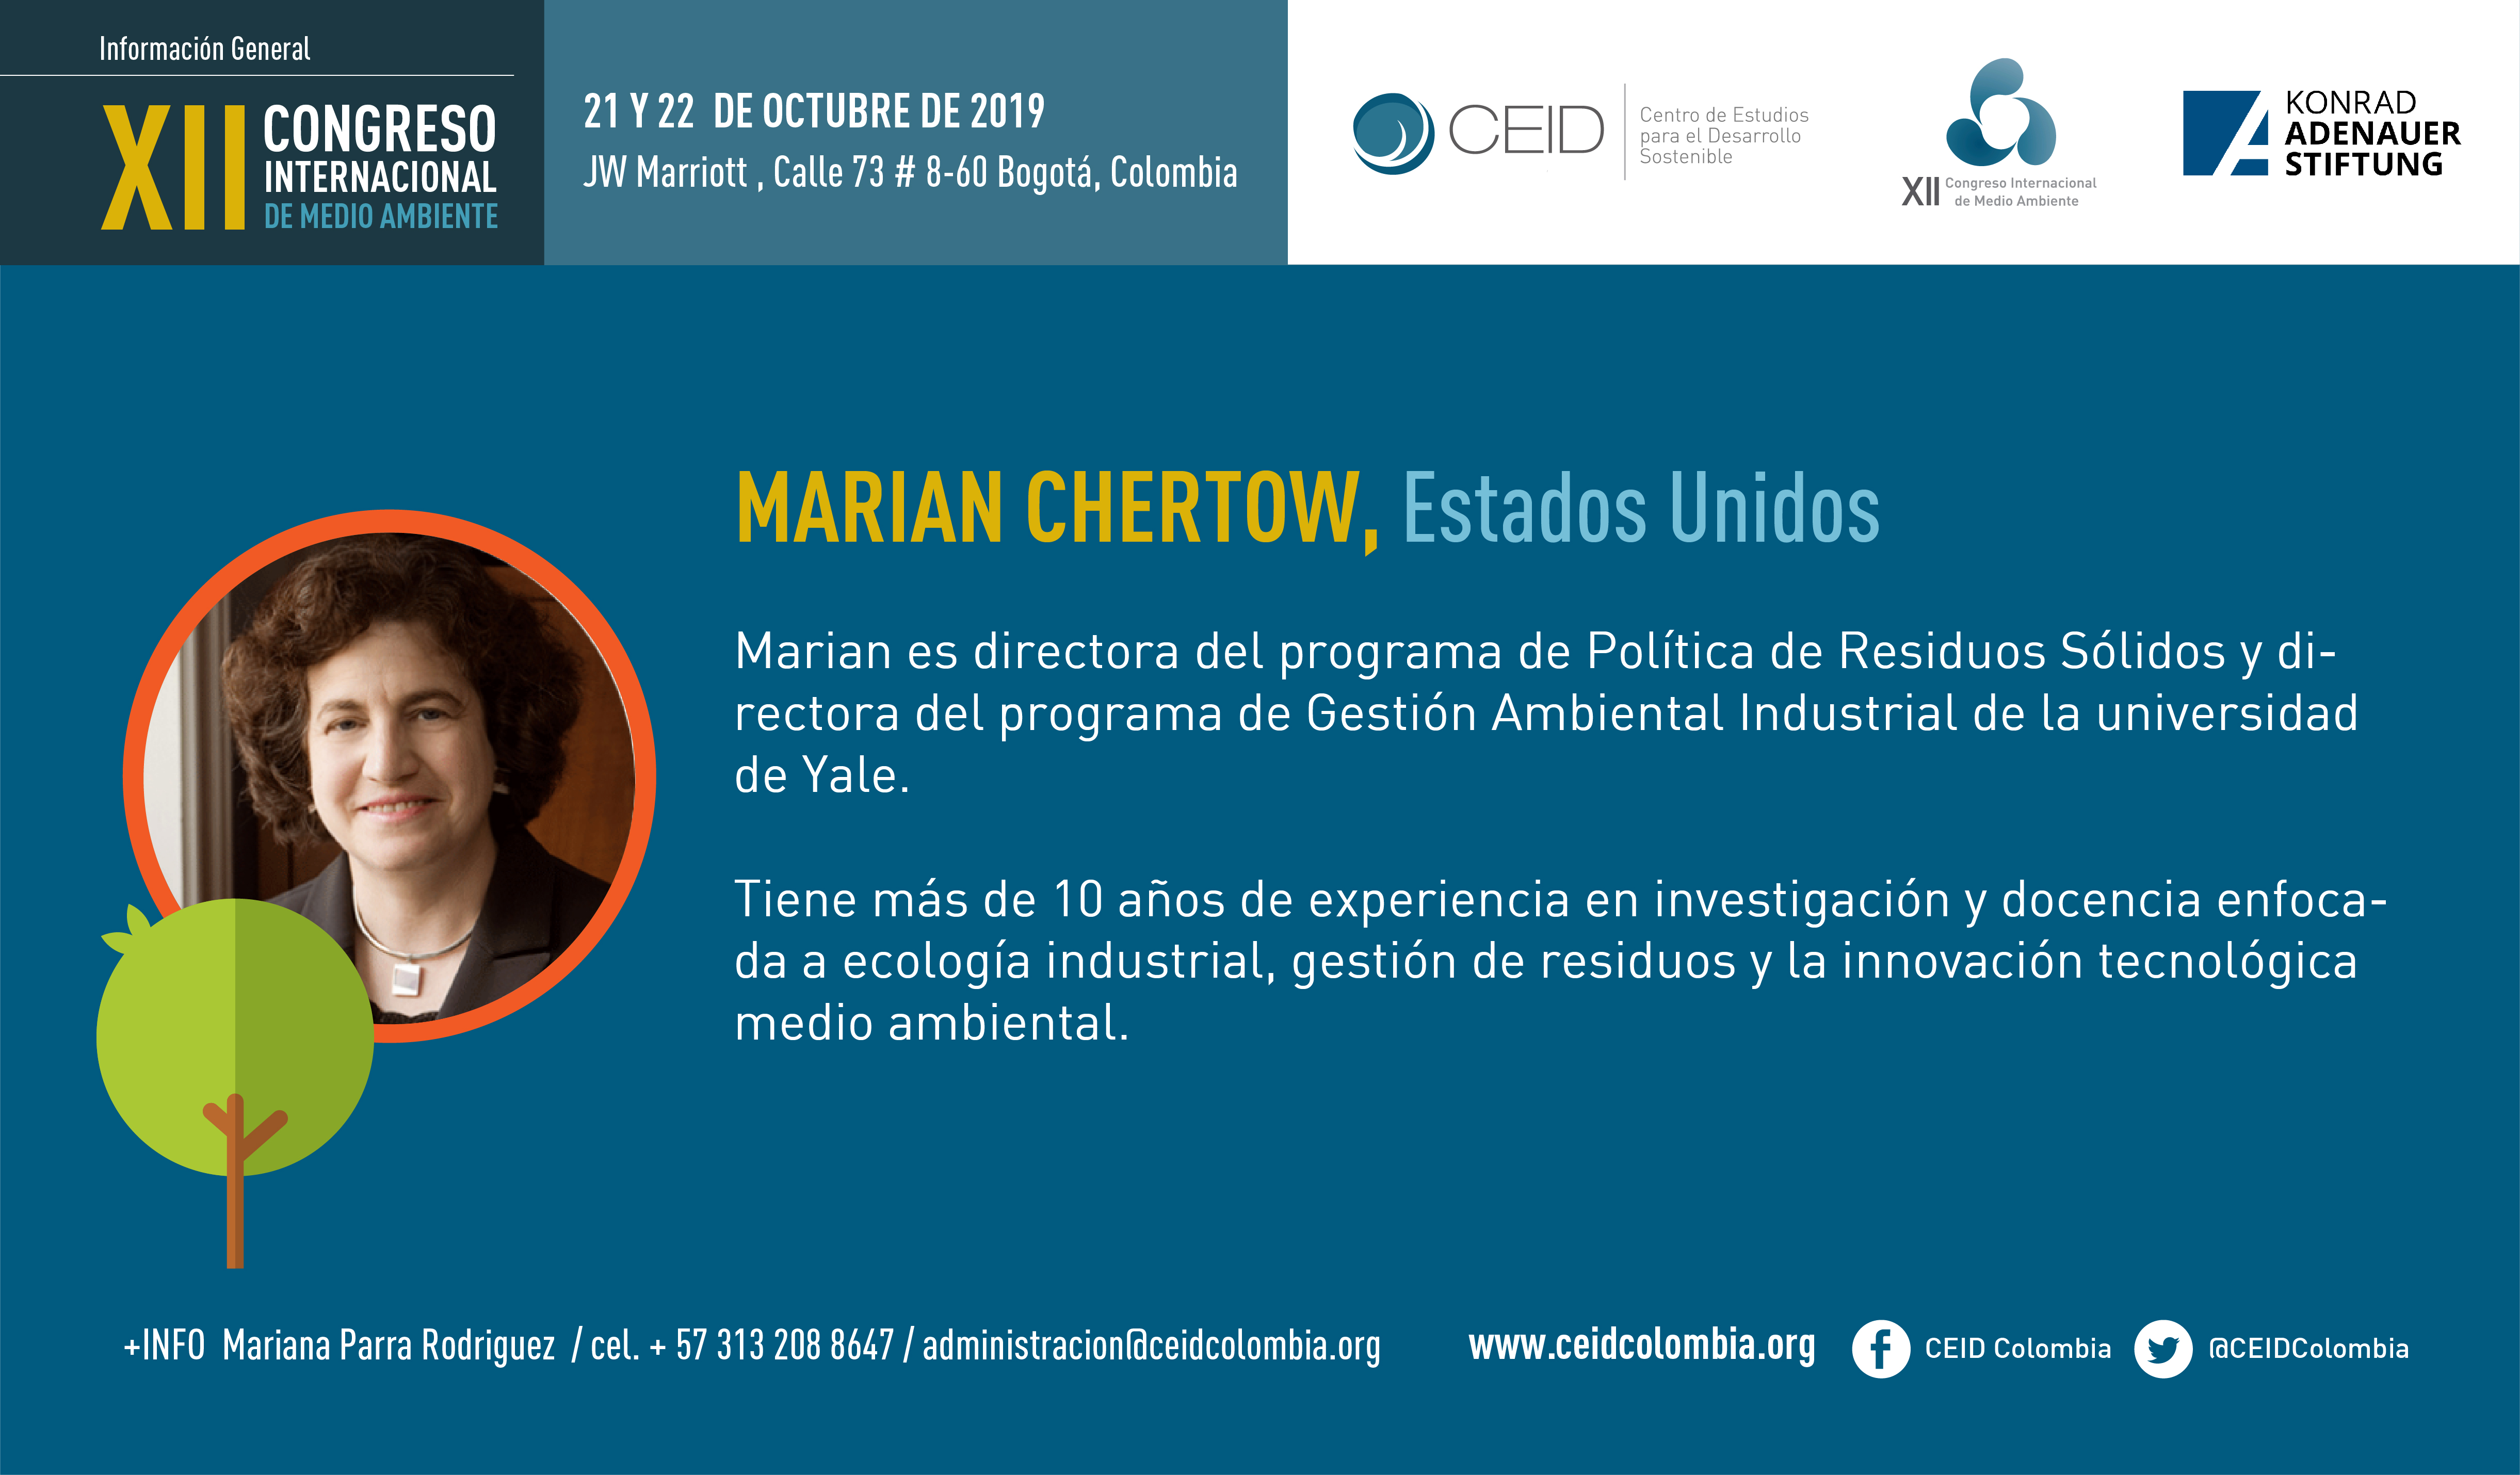 Marian cherton